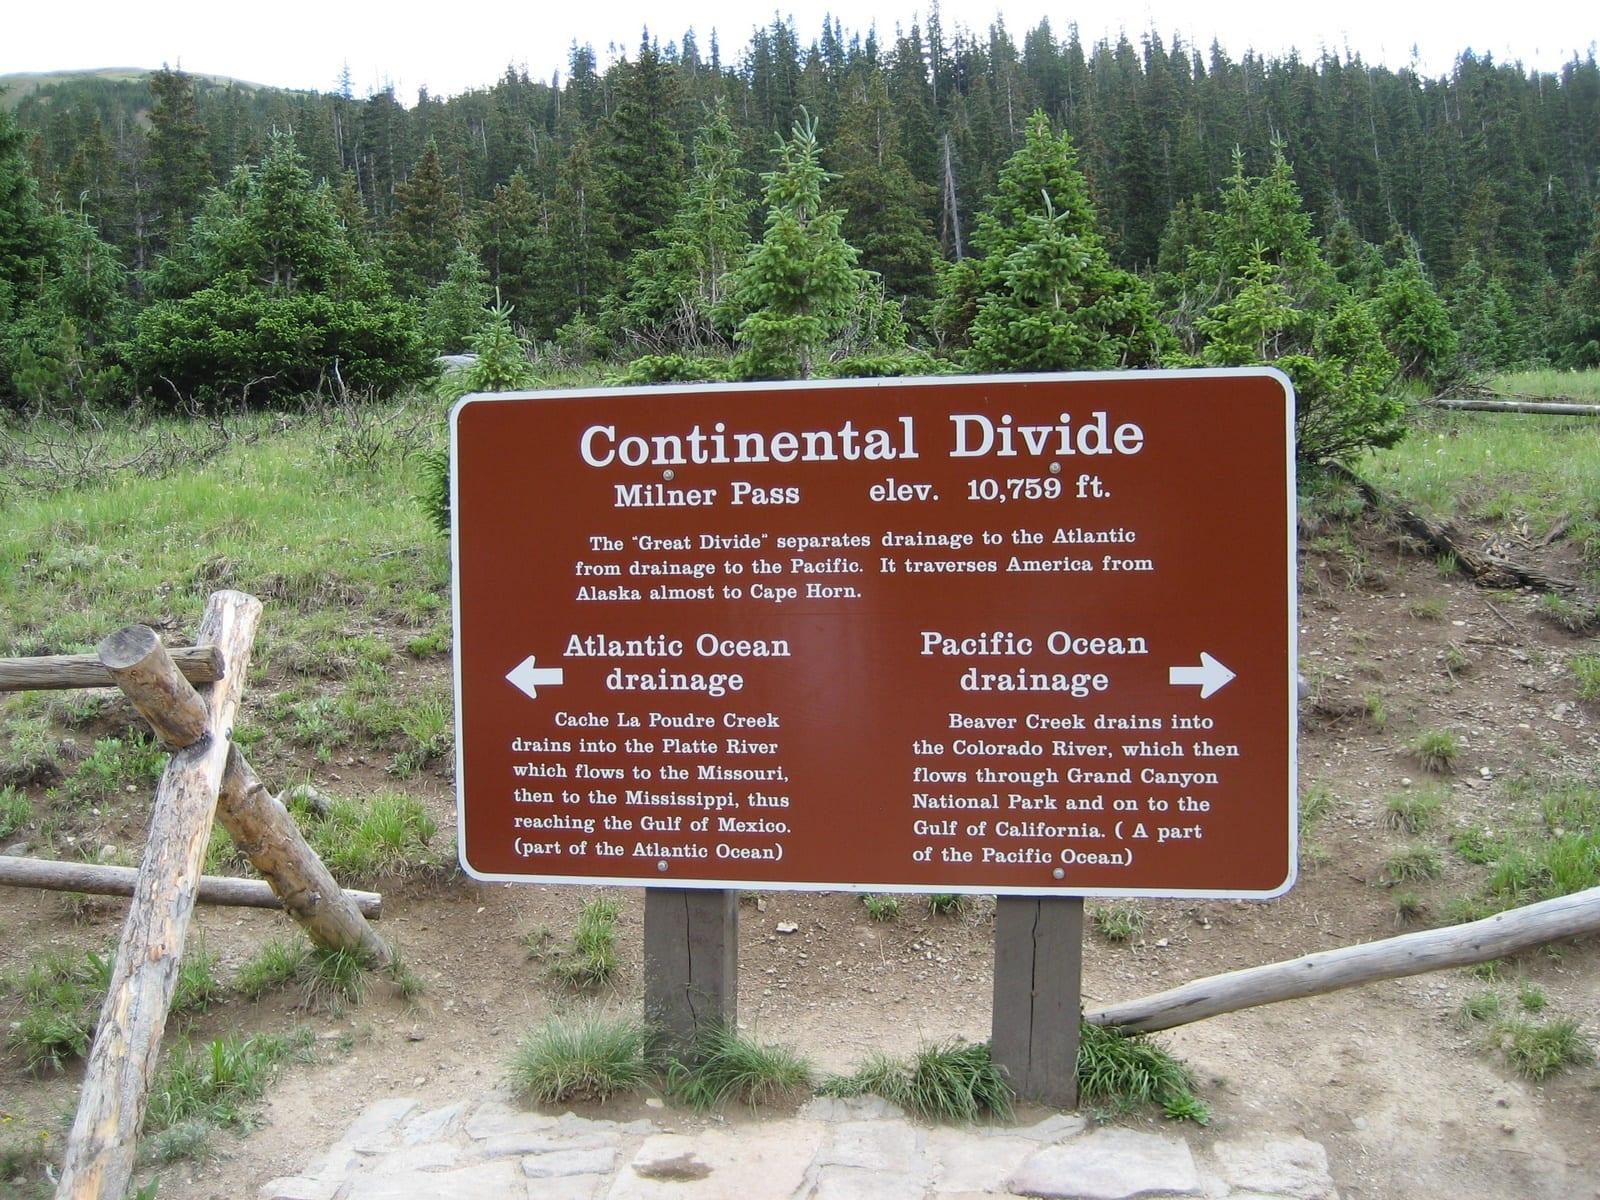 Trail Ridge Road Milner Pass Continental Divide Sign